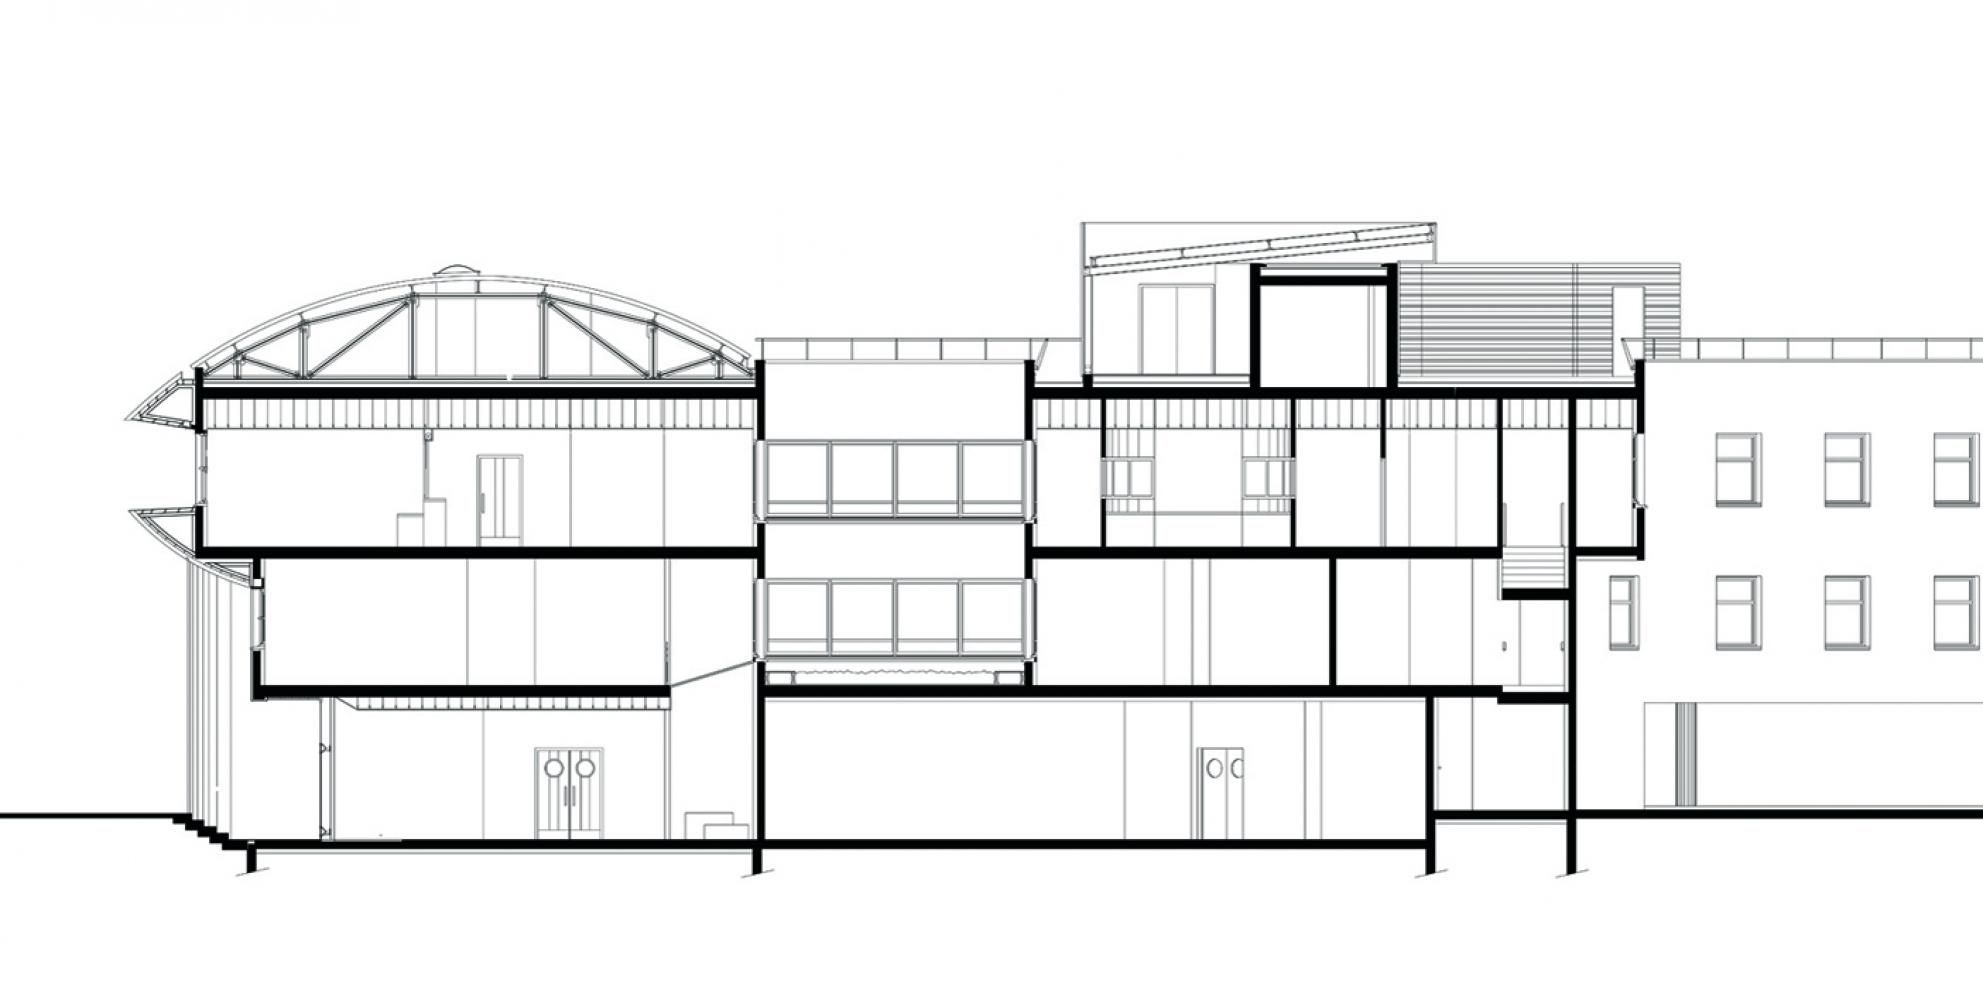 zzval---15 Pascale SEURIN Architecte - Pascale SEURIN Architecte